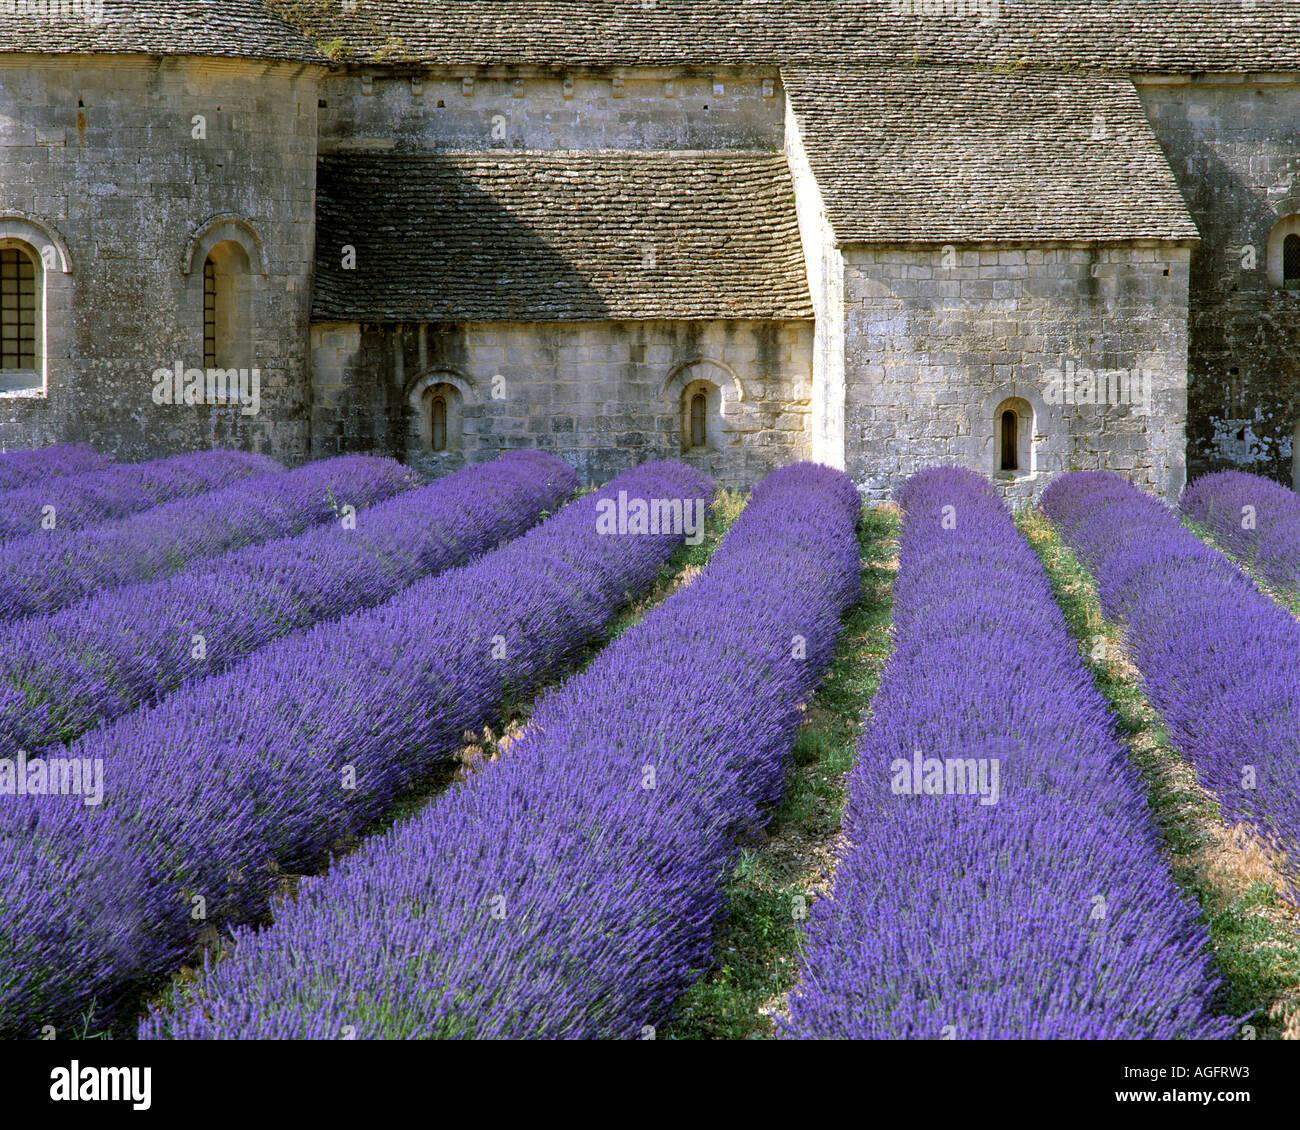 FR - PROVENCE: Abbaye de Sénanque dans le Luberon Photo Stock